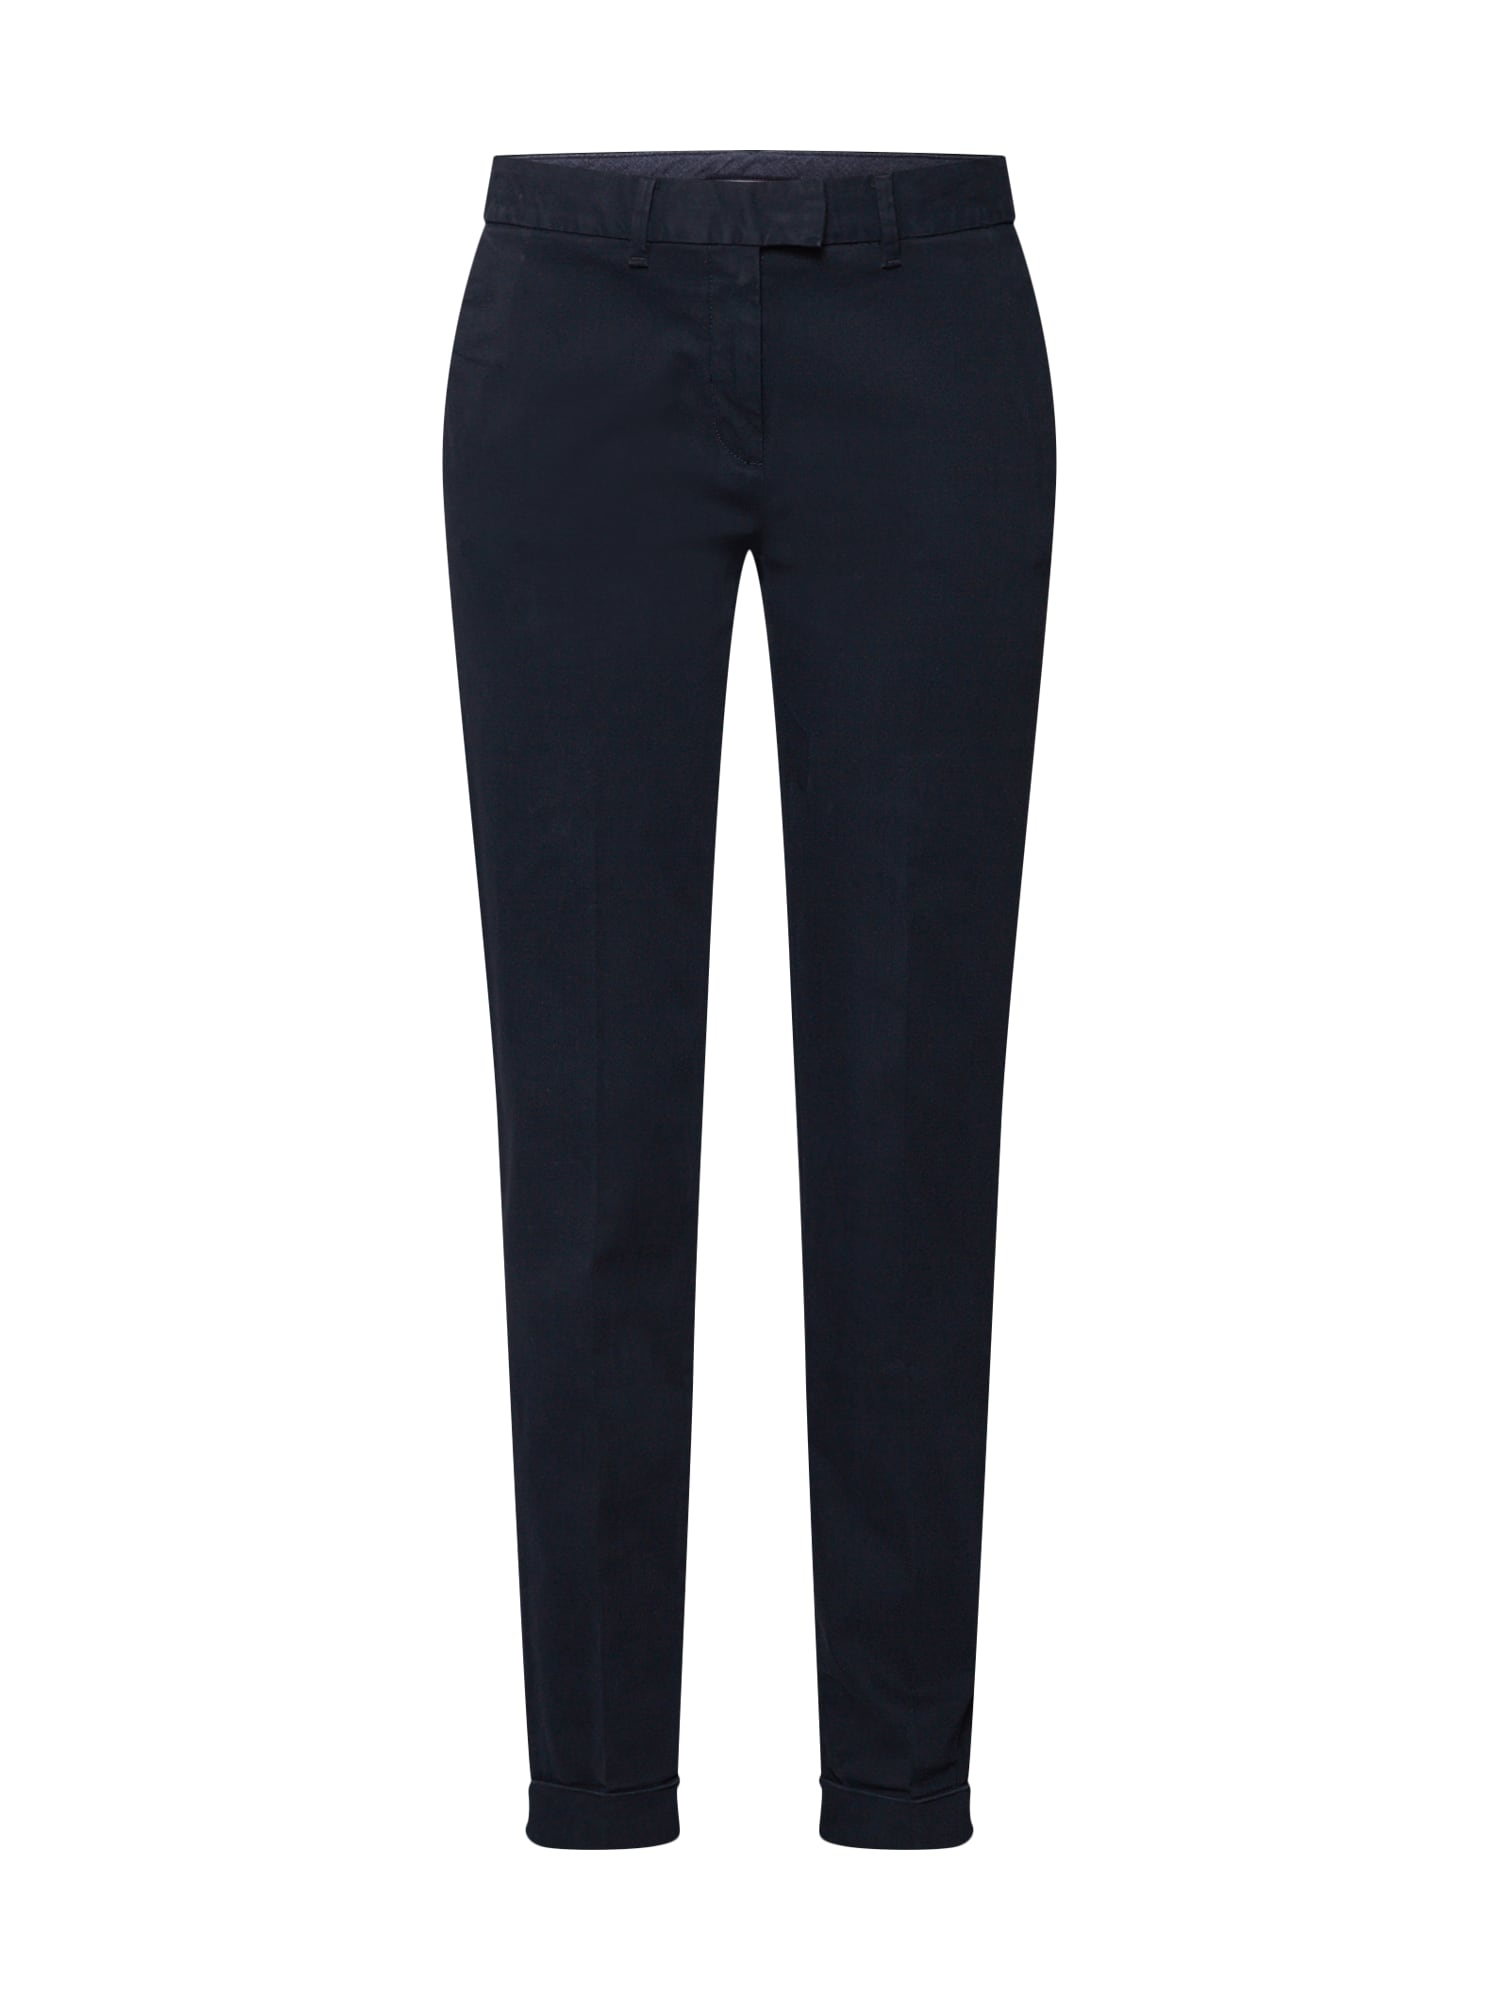 Chino kalhoty Heritage tmavě modrá TOMMY HILFIGER